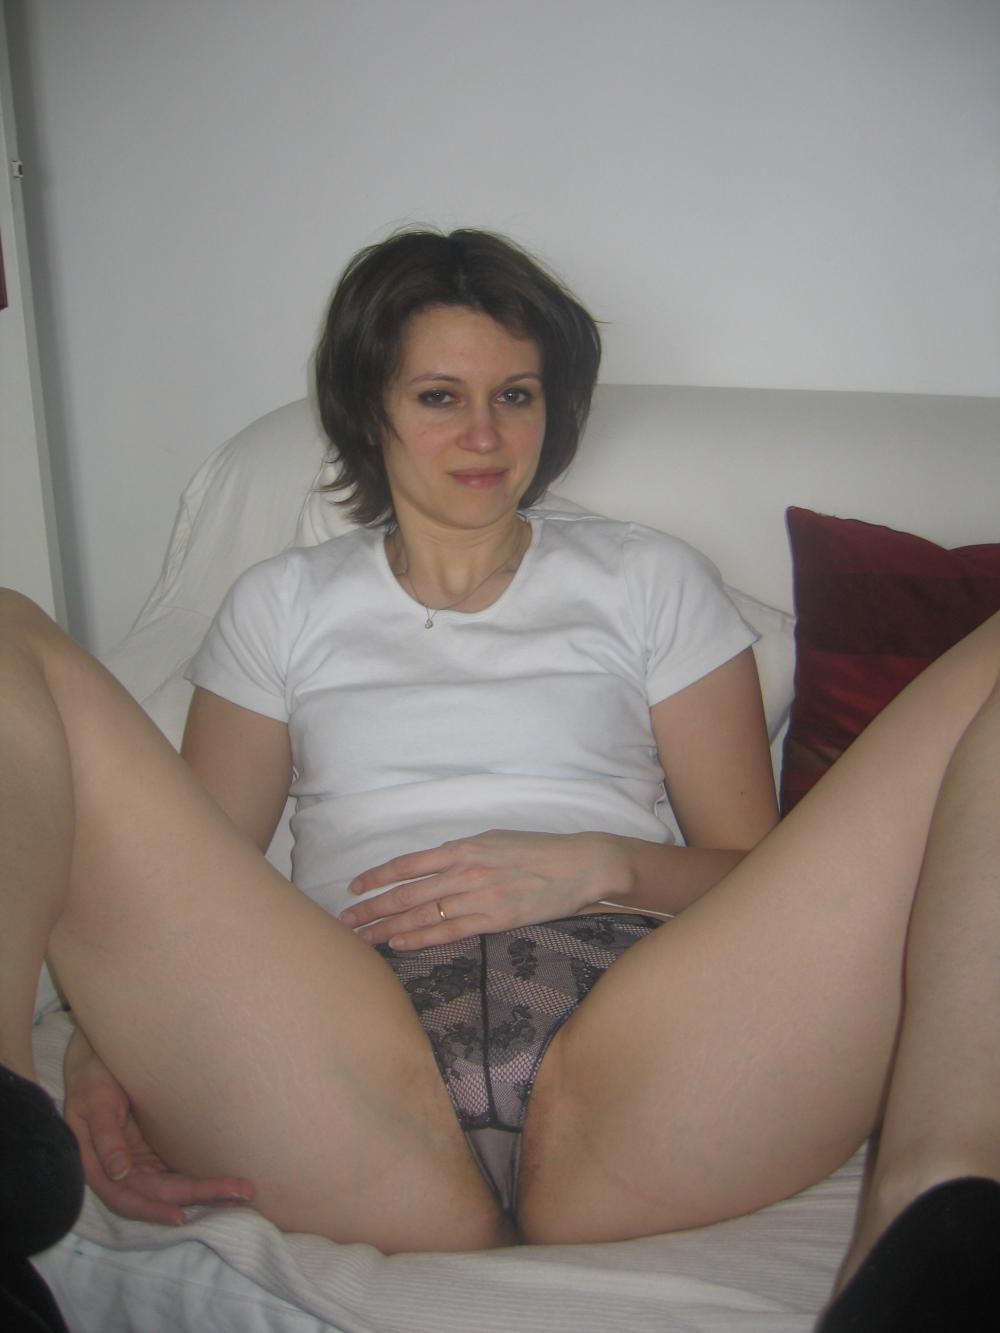 annonce sexe femme Brive-la-Gaillarde